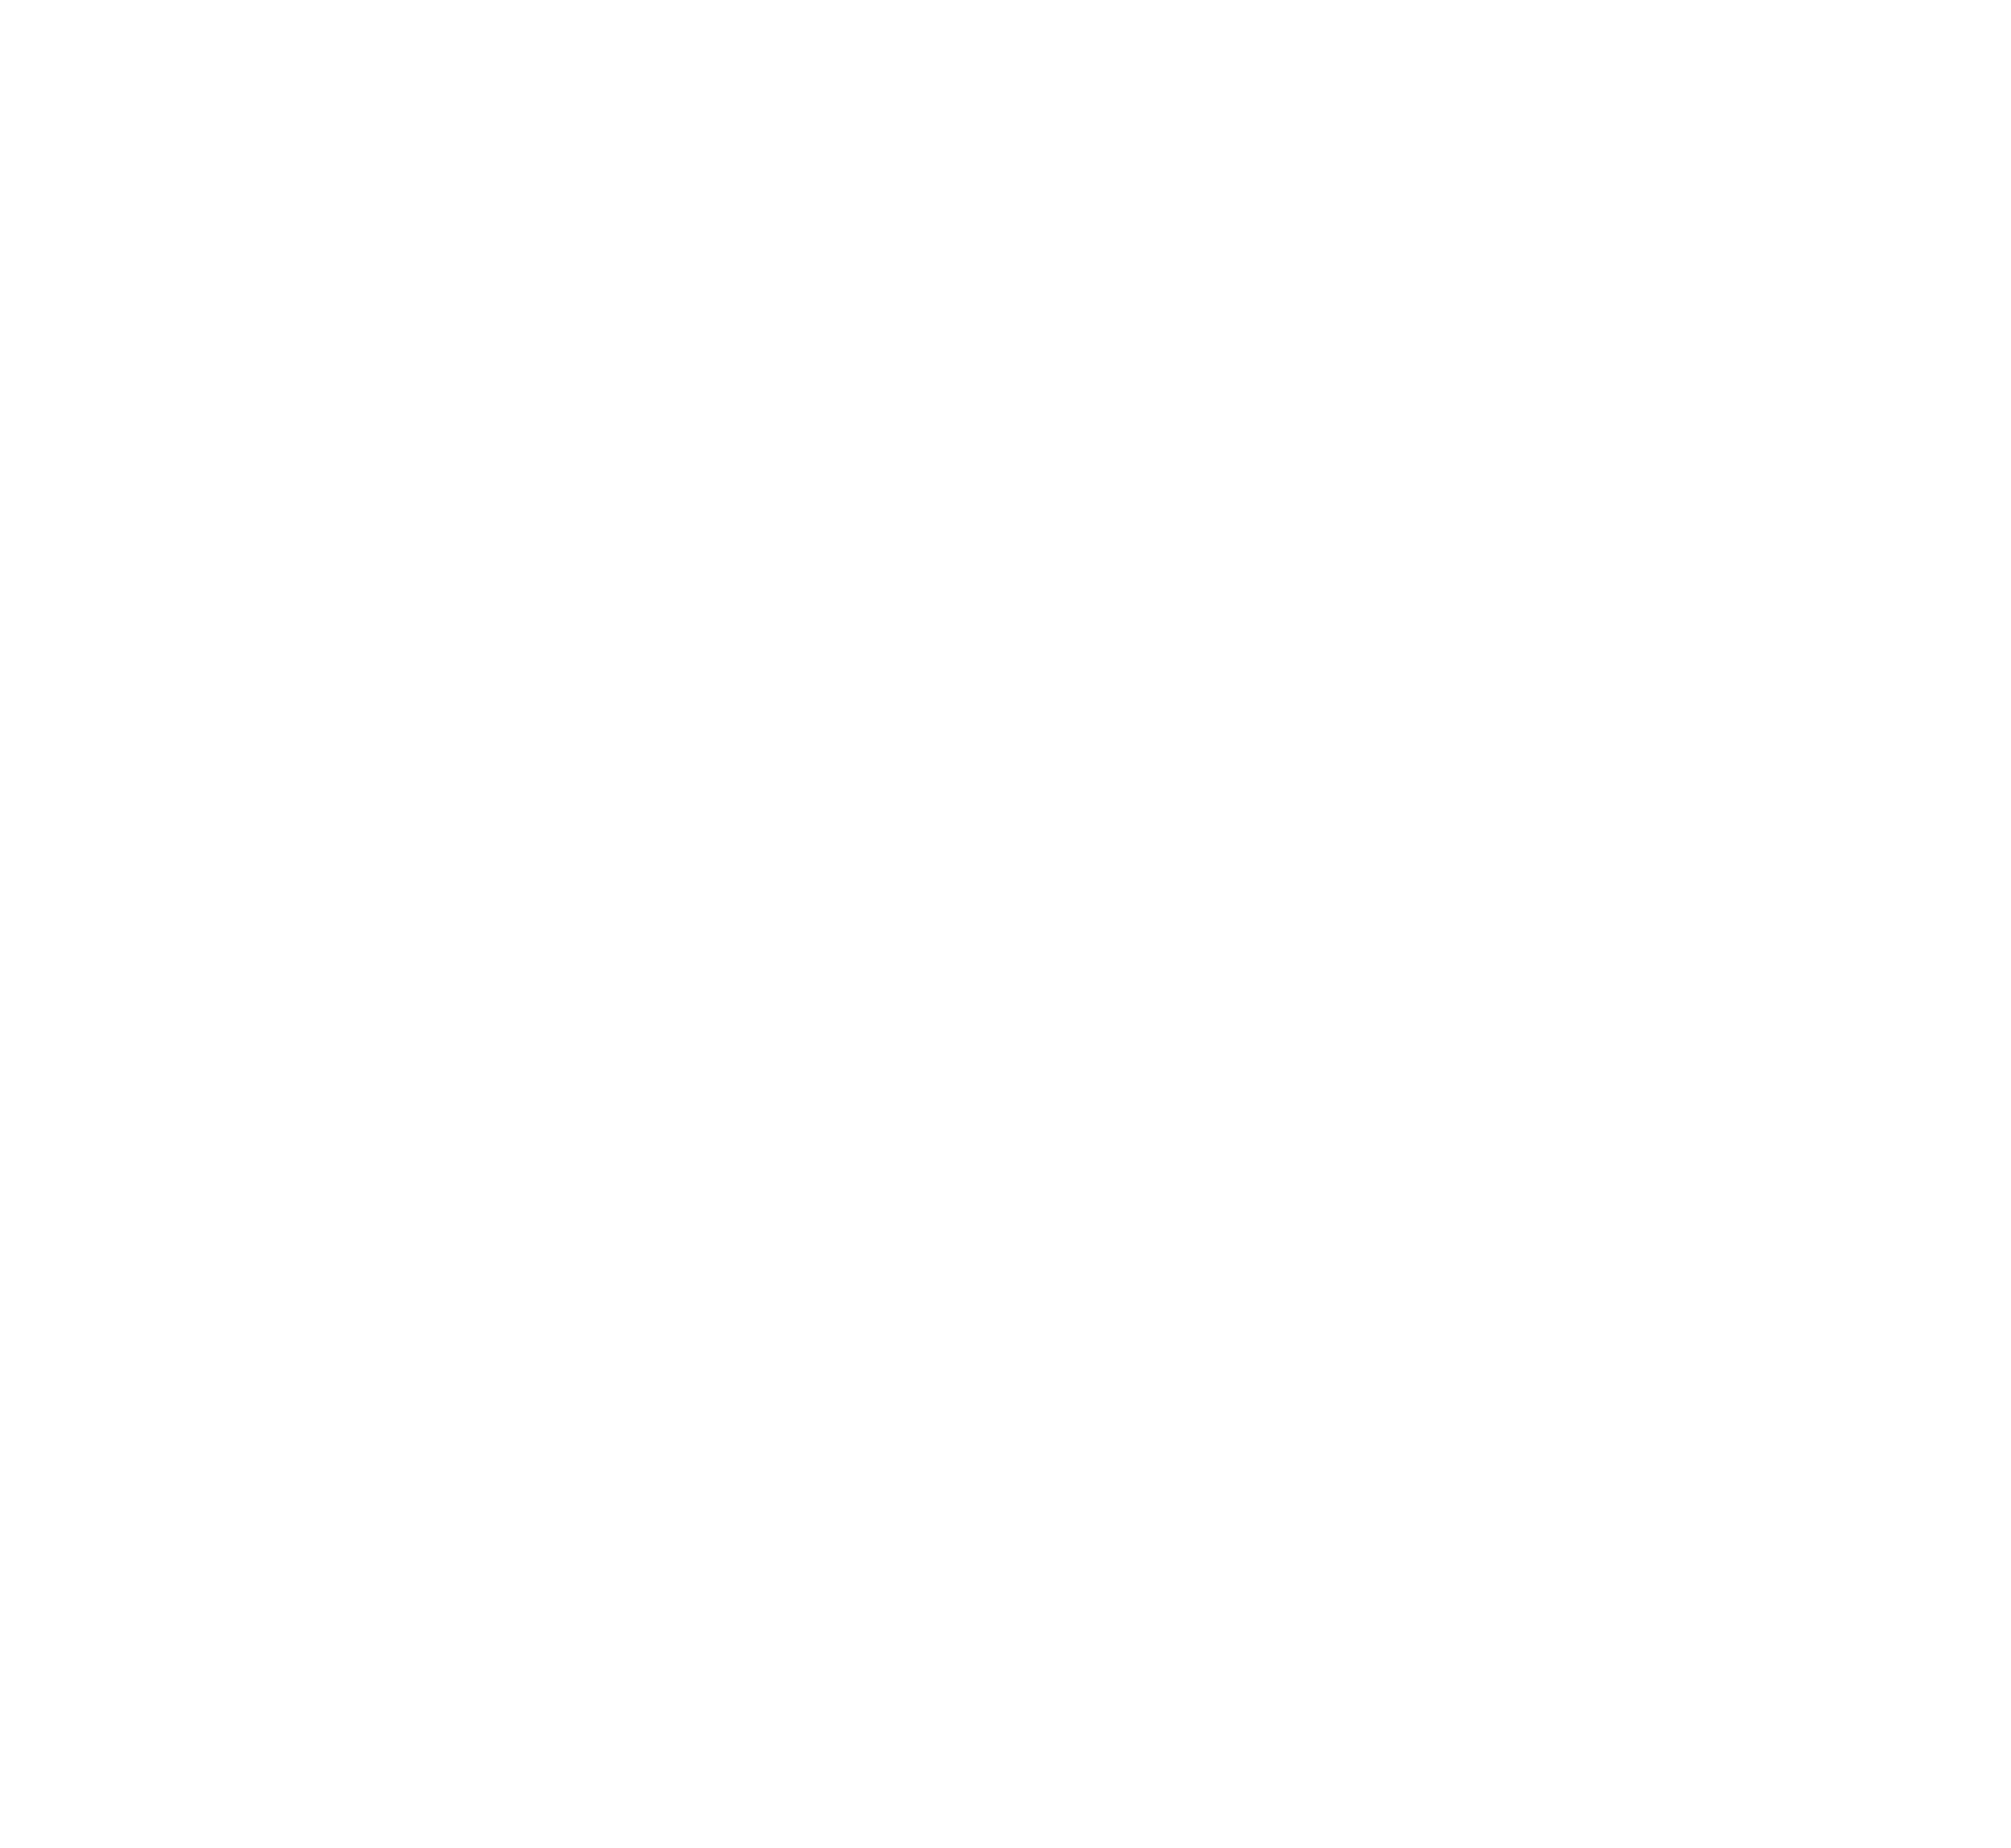 Download 2018 Ubisoft Entertainment Ubisoft Logo 2017 Png Full Size Png Image Pngkit